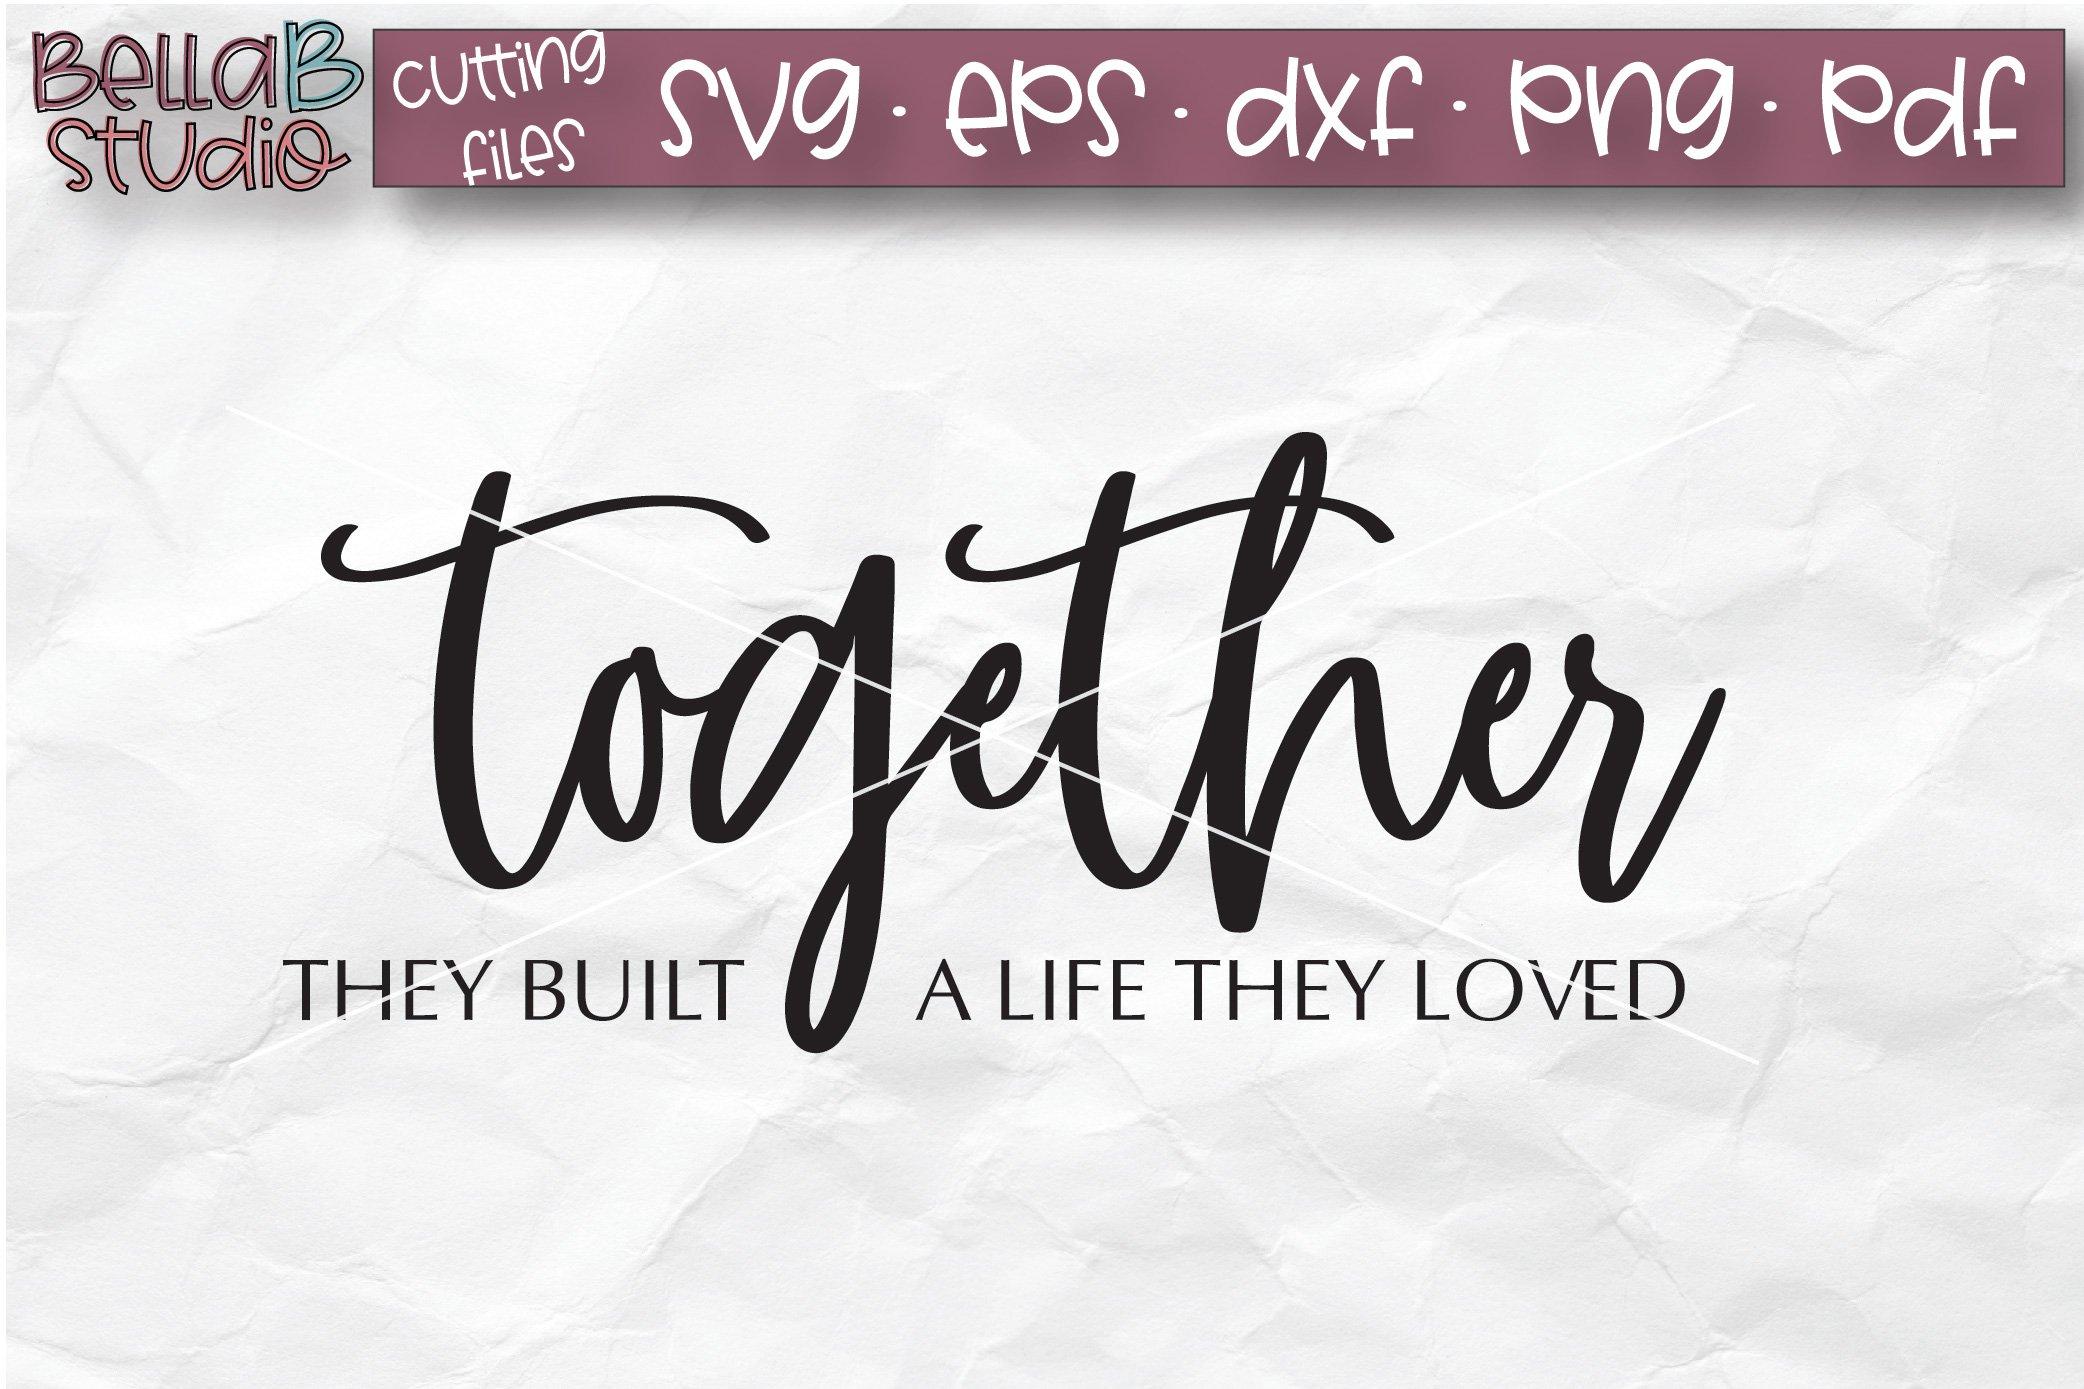 Together They Built A Life They Loved Svg Wood Sign Design 162289 Svgs Design Bundles